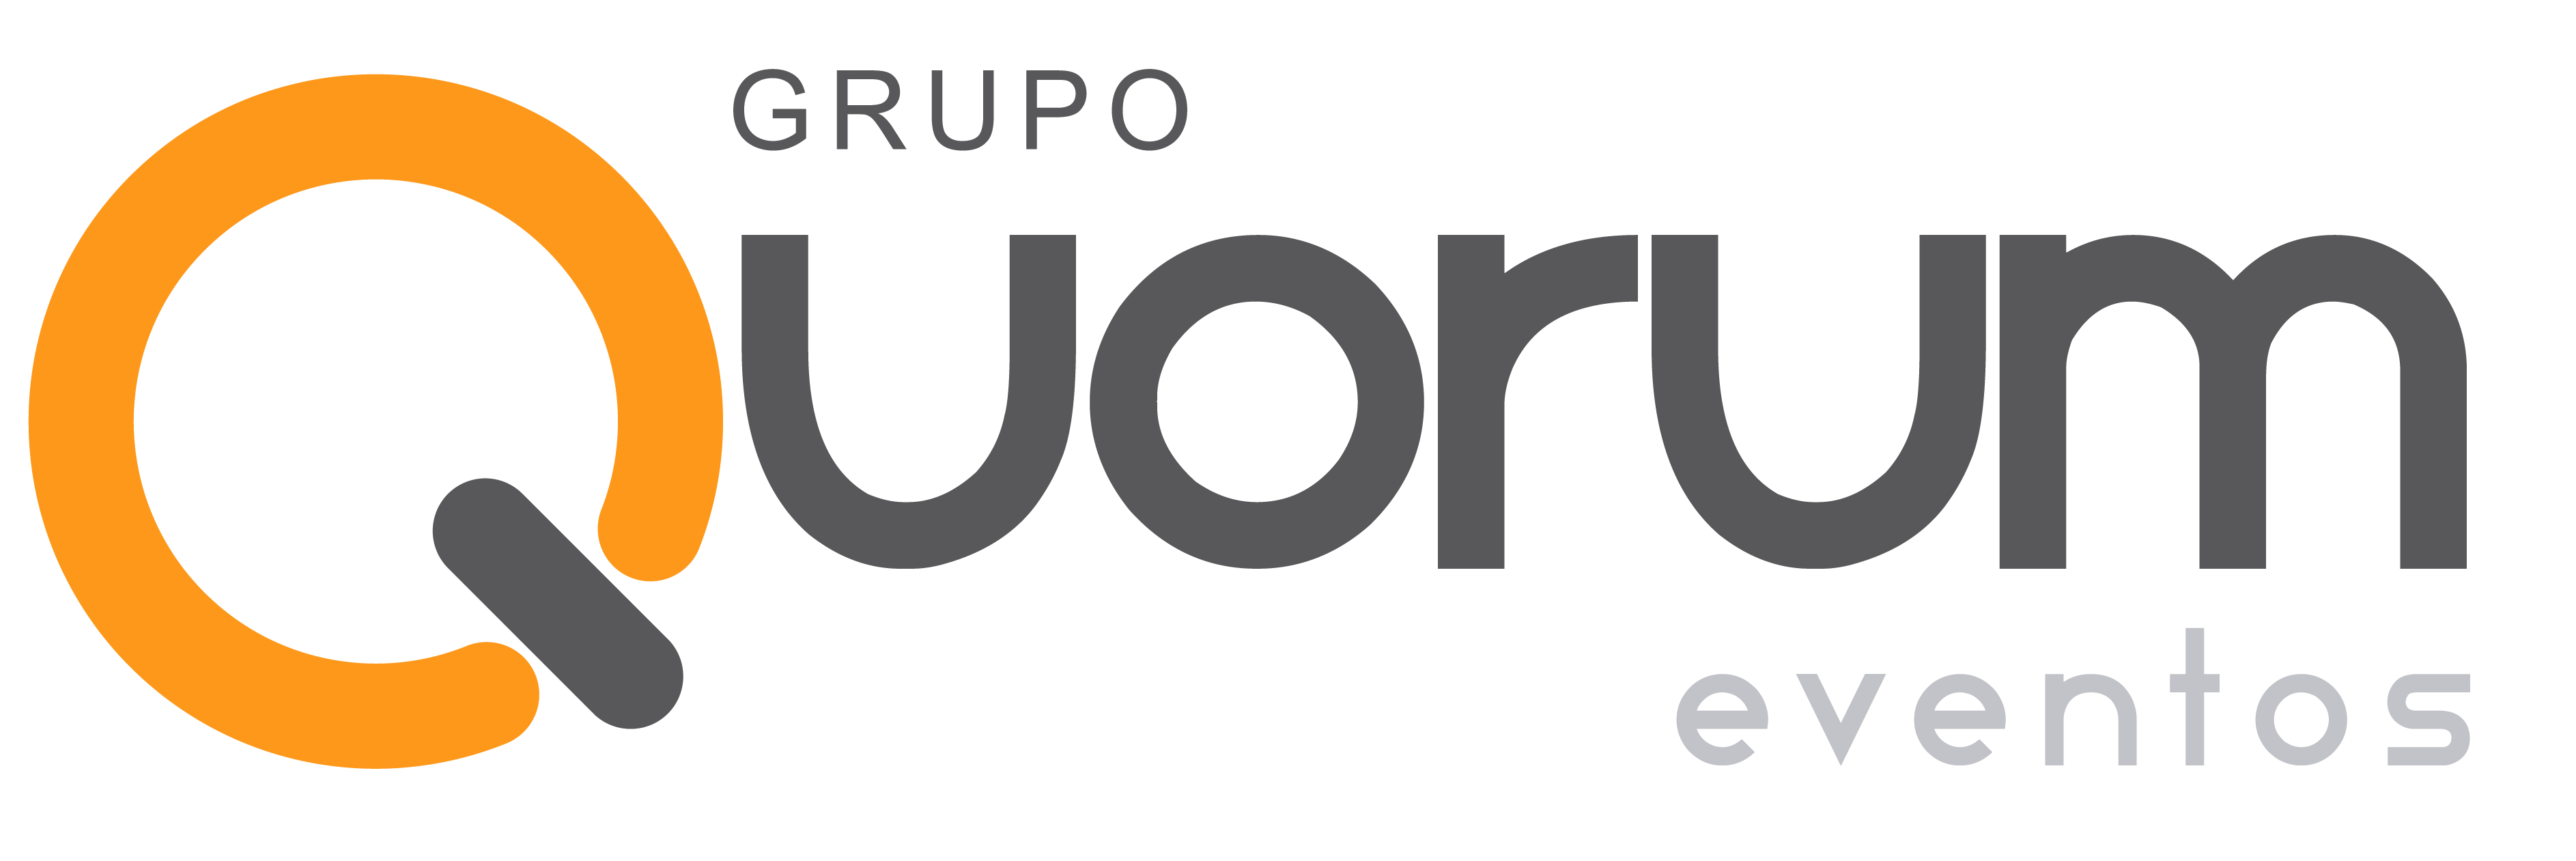 www.grupoquorum.org